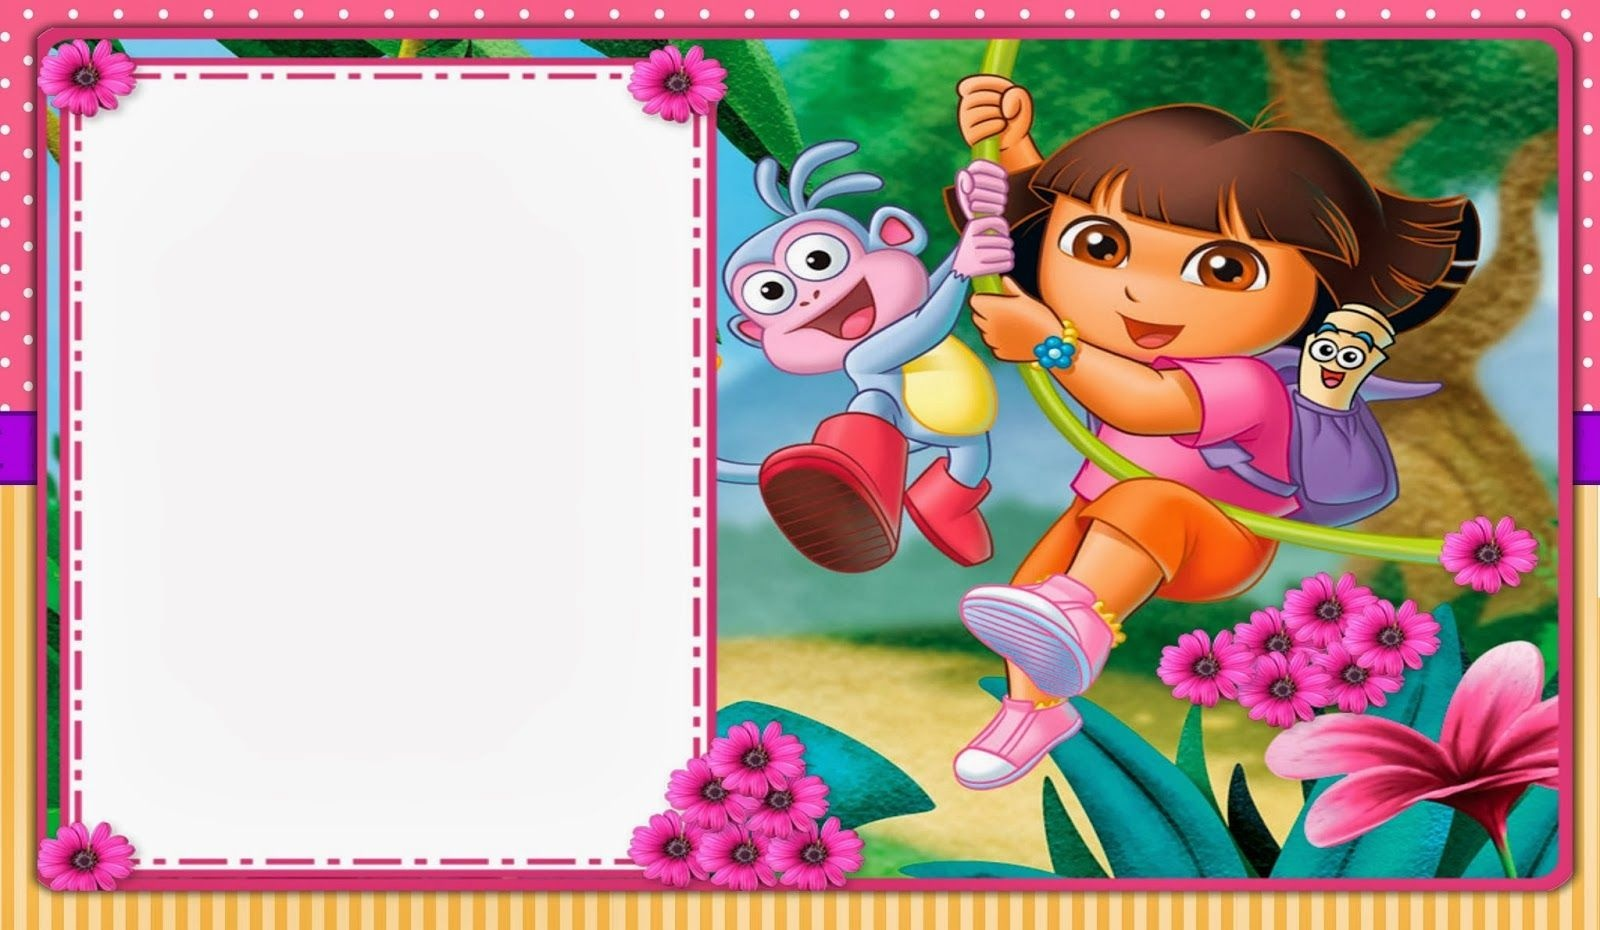 Dora The Explorer: Free Printable Invitations And Party Printables - Free Dora Party Printables